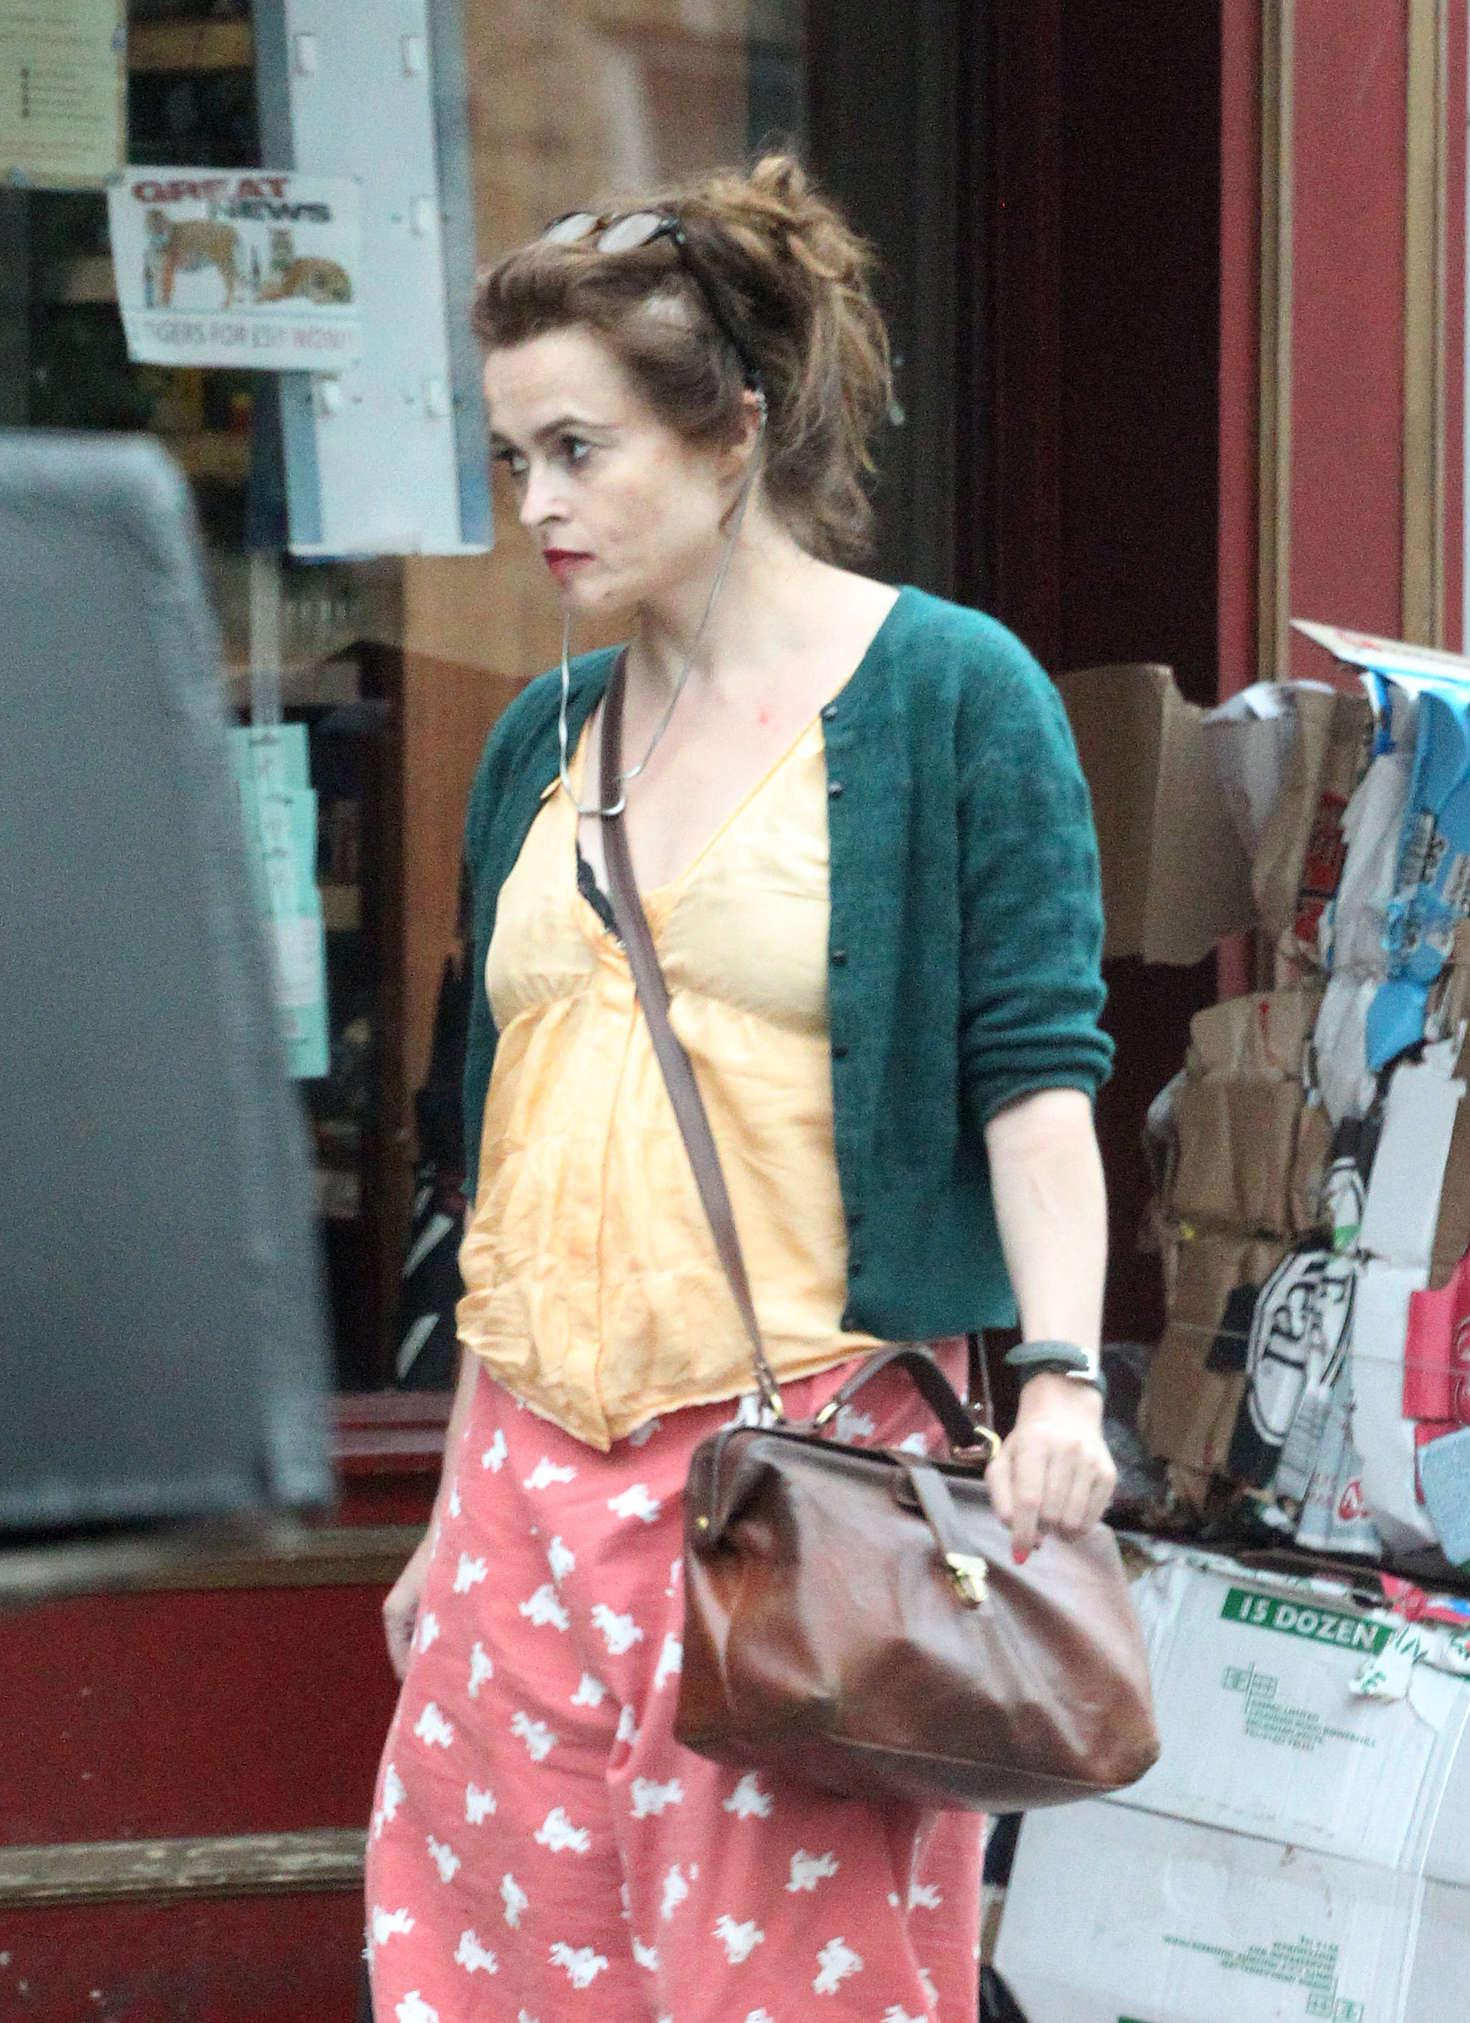 Helena Bonham Carter out in London